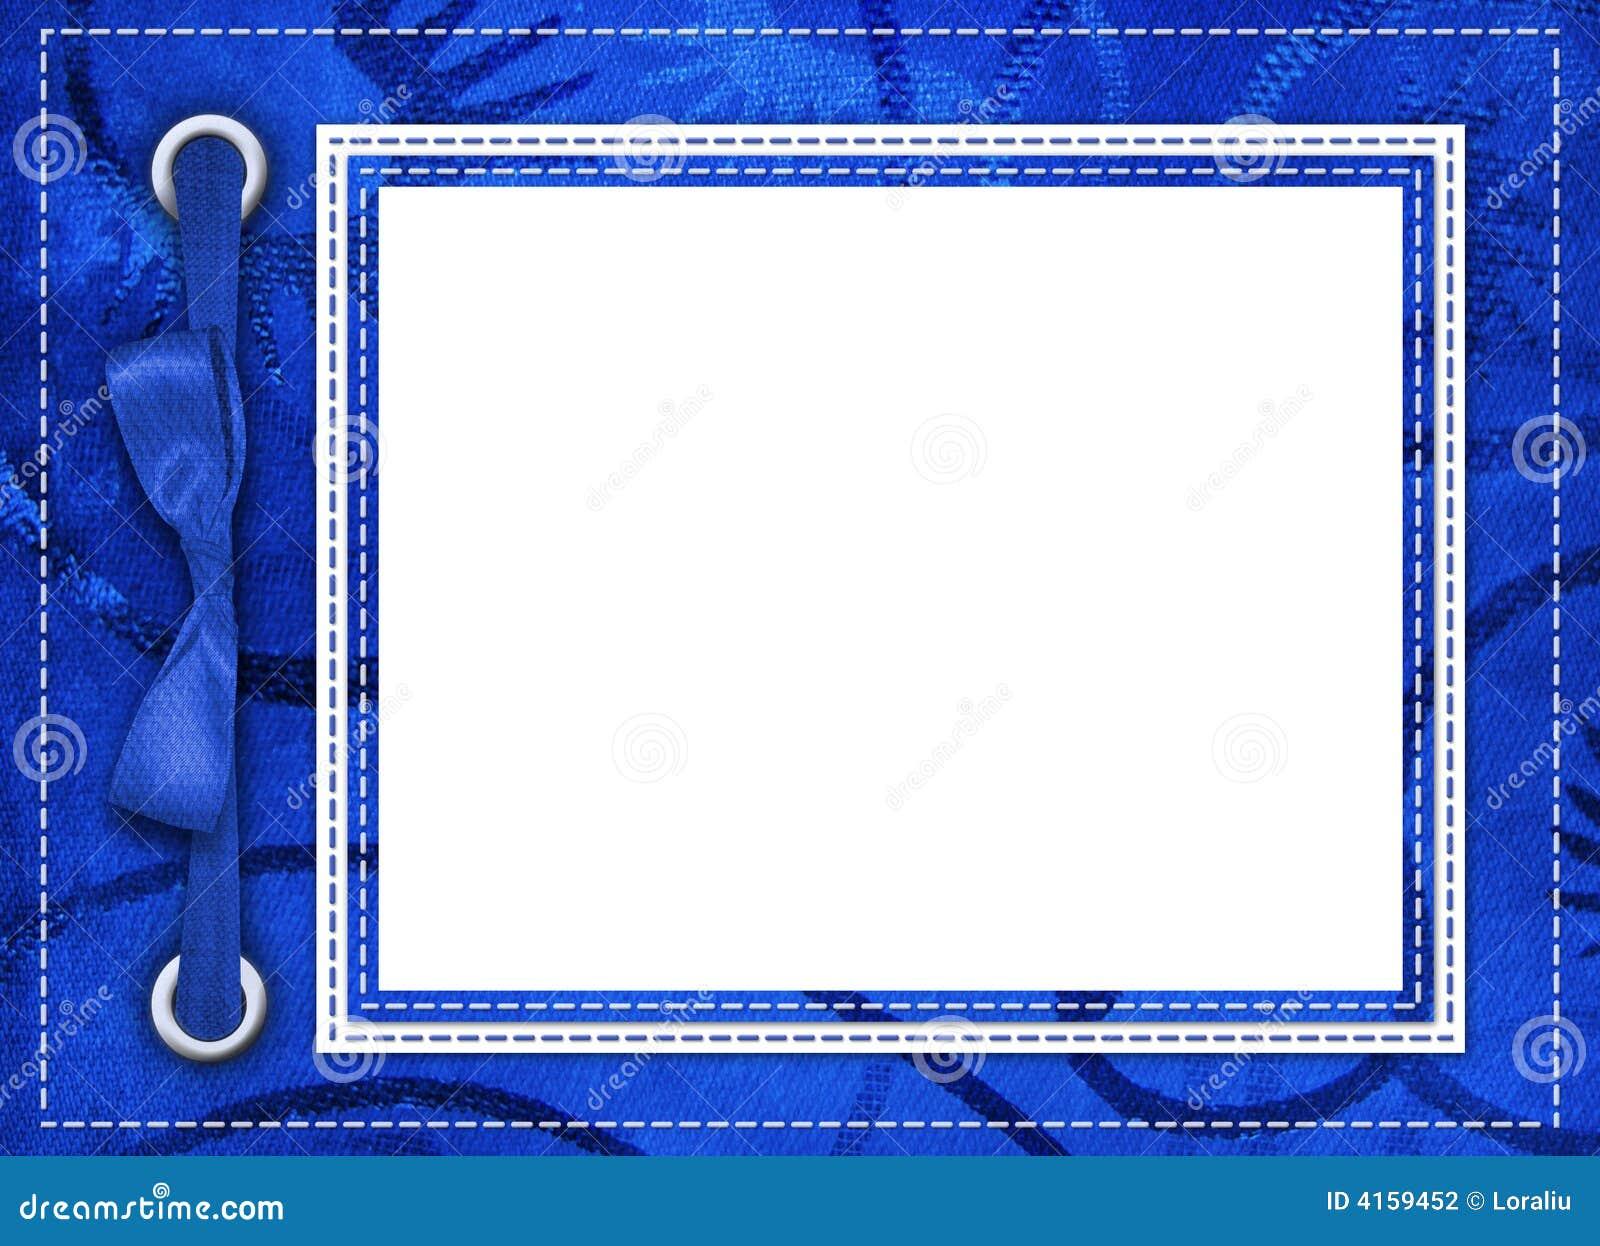 Magnífico Marcos De Fotos Azules Viñeta - Ideas Personalizadas de ...